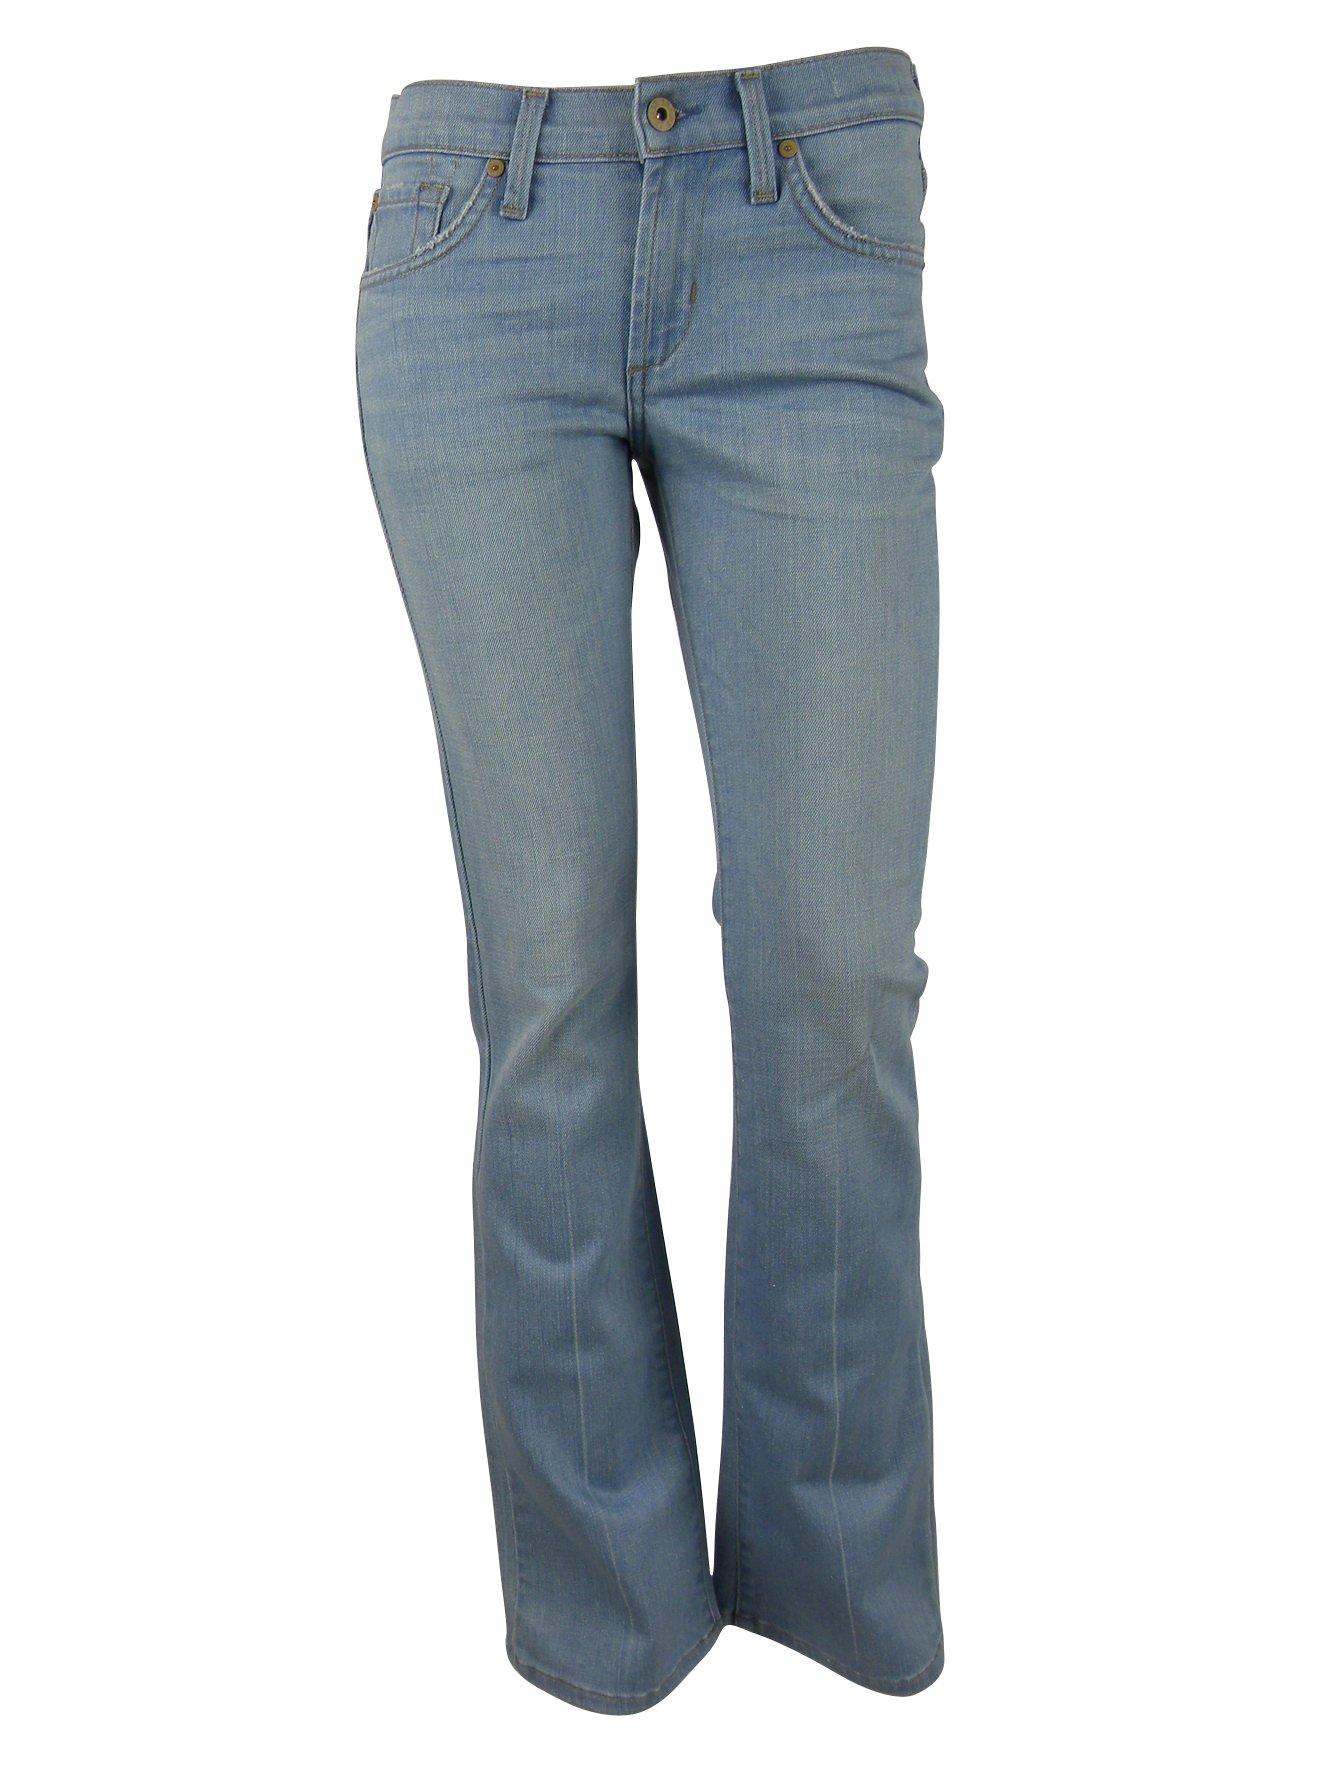 James Jeans Womens Tiffany Reboot Skinny Boot Leg 5-Pocket Jeans 25